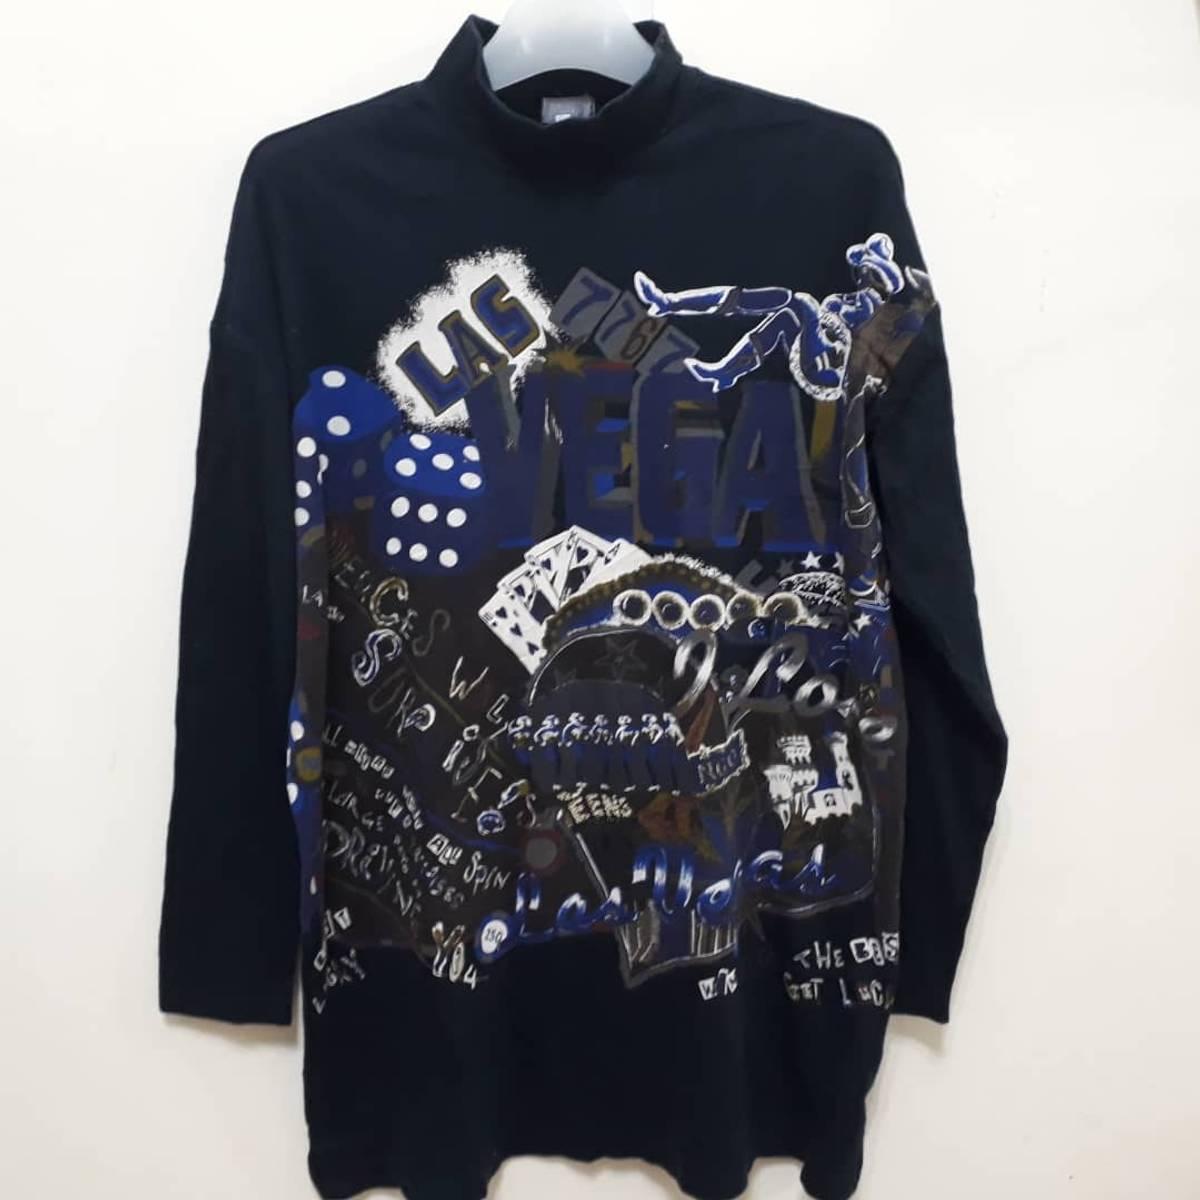 Designer Tokuko 1er Vol Long Sleeve T Shirt High Neck Tokuyuki Maeda Japanese Tops Fashion Designer Las Vegas Art Sz 9 Good Condition Grailed